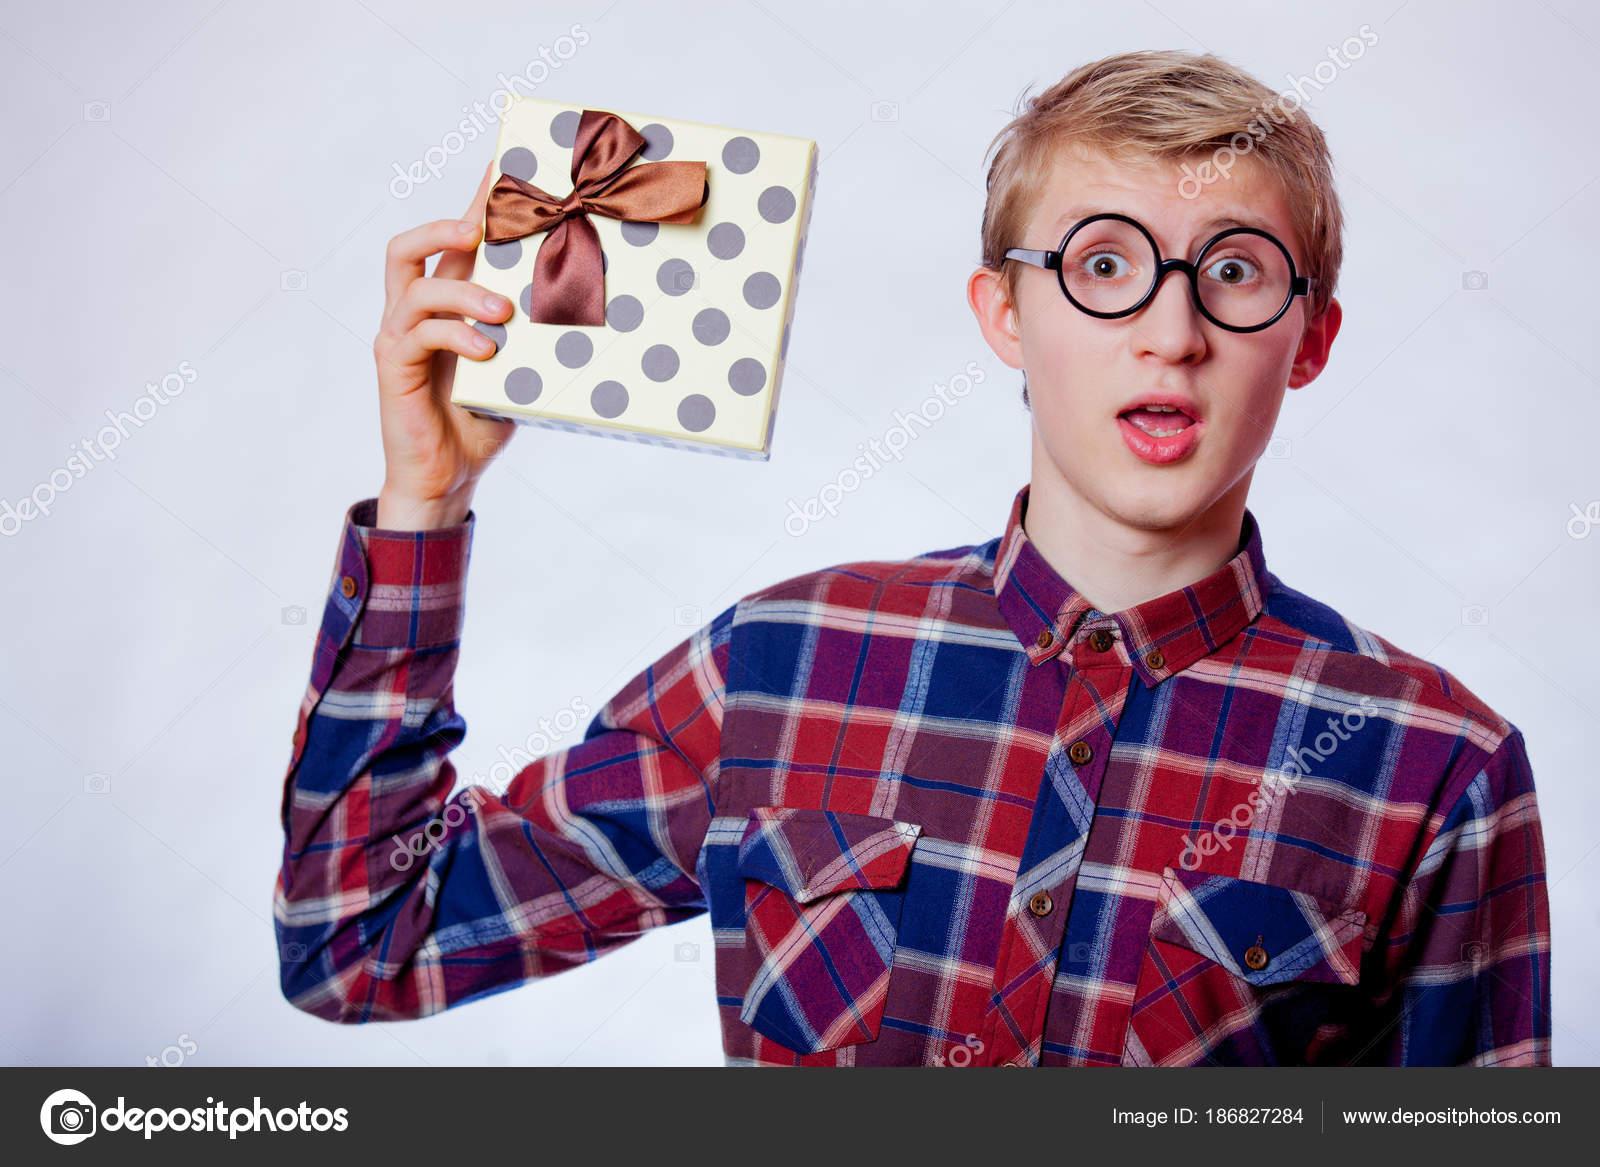 6b092a9cea Nerd Νέοι Έφηβος Αγόρι Γυαλιά Και Δώρο Πλαίσιο Λευκό Φόντο– εικόνα αρχείου